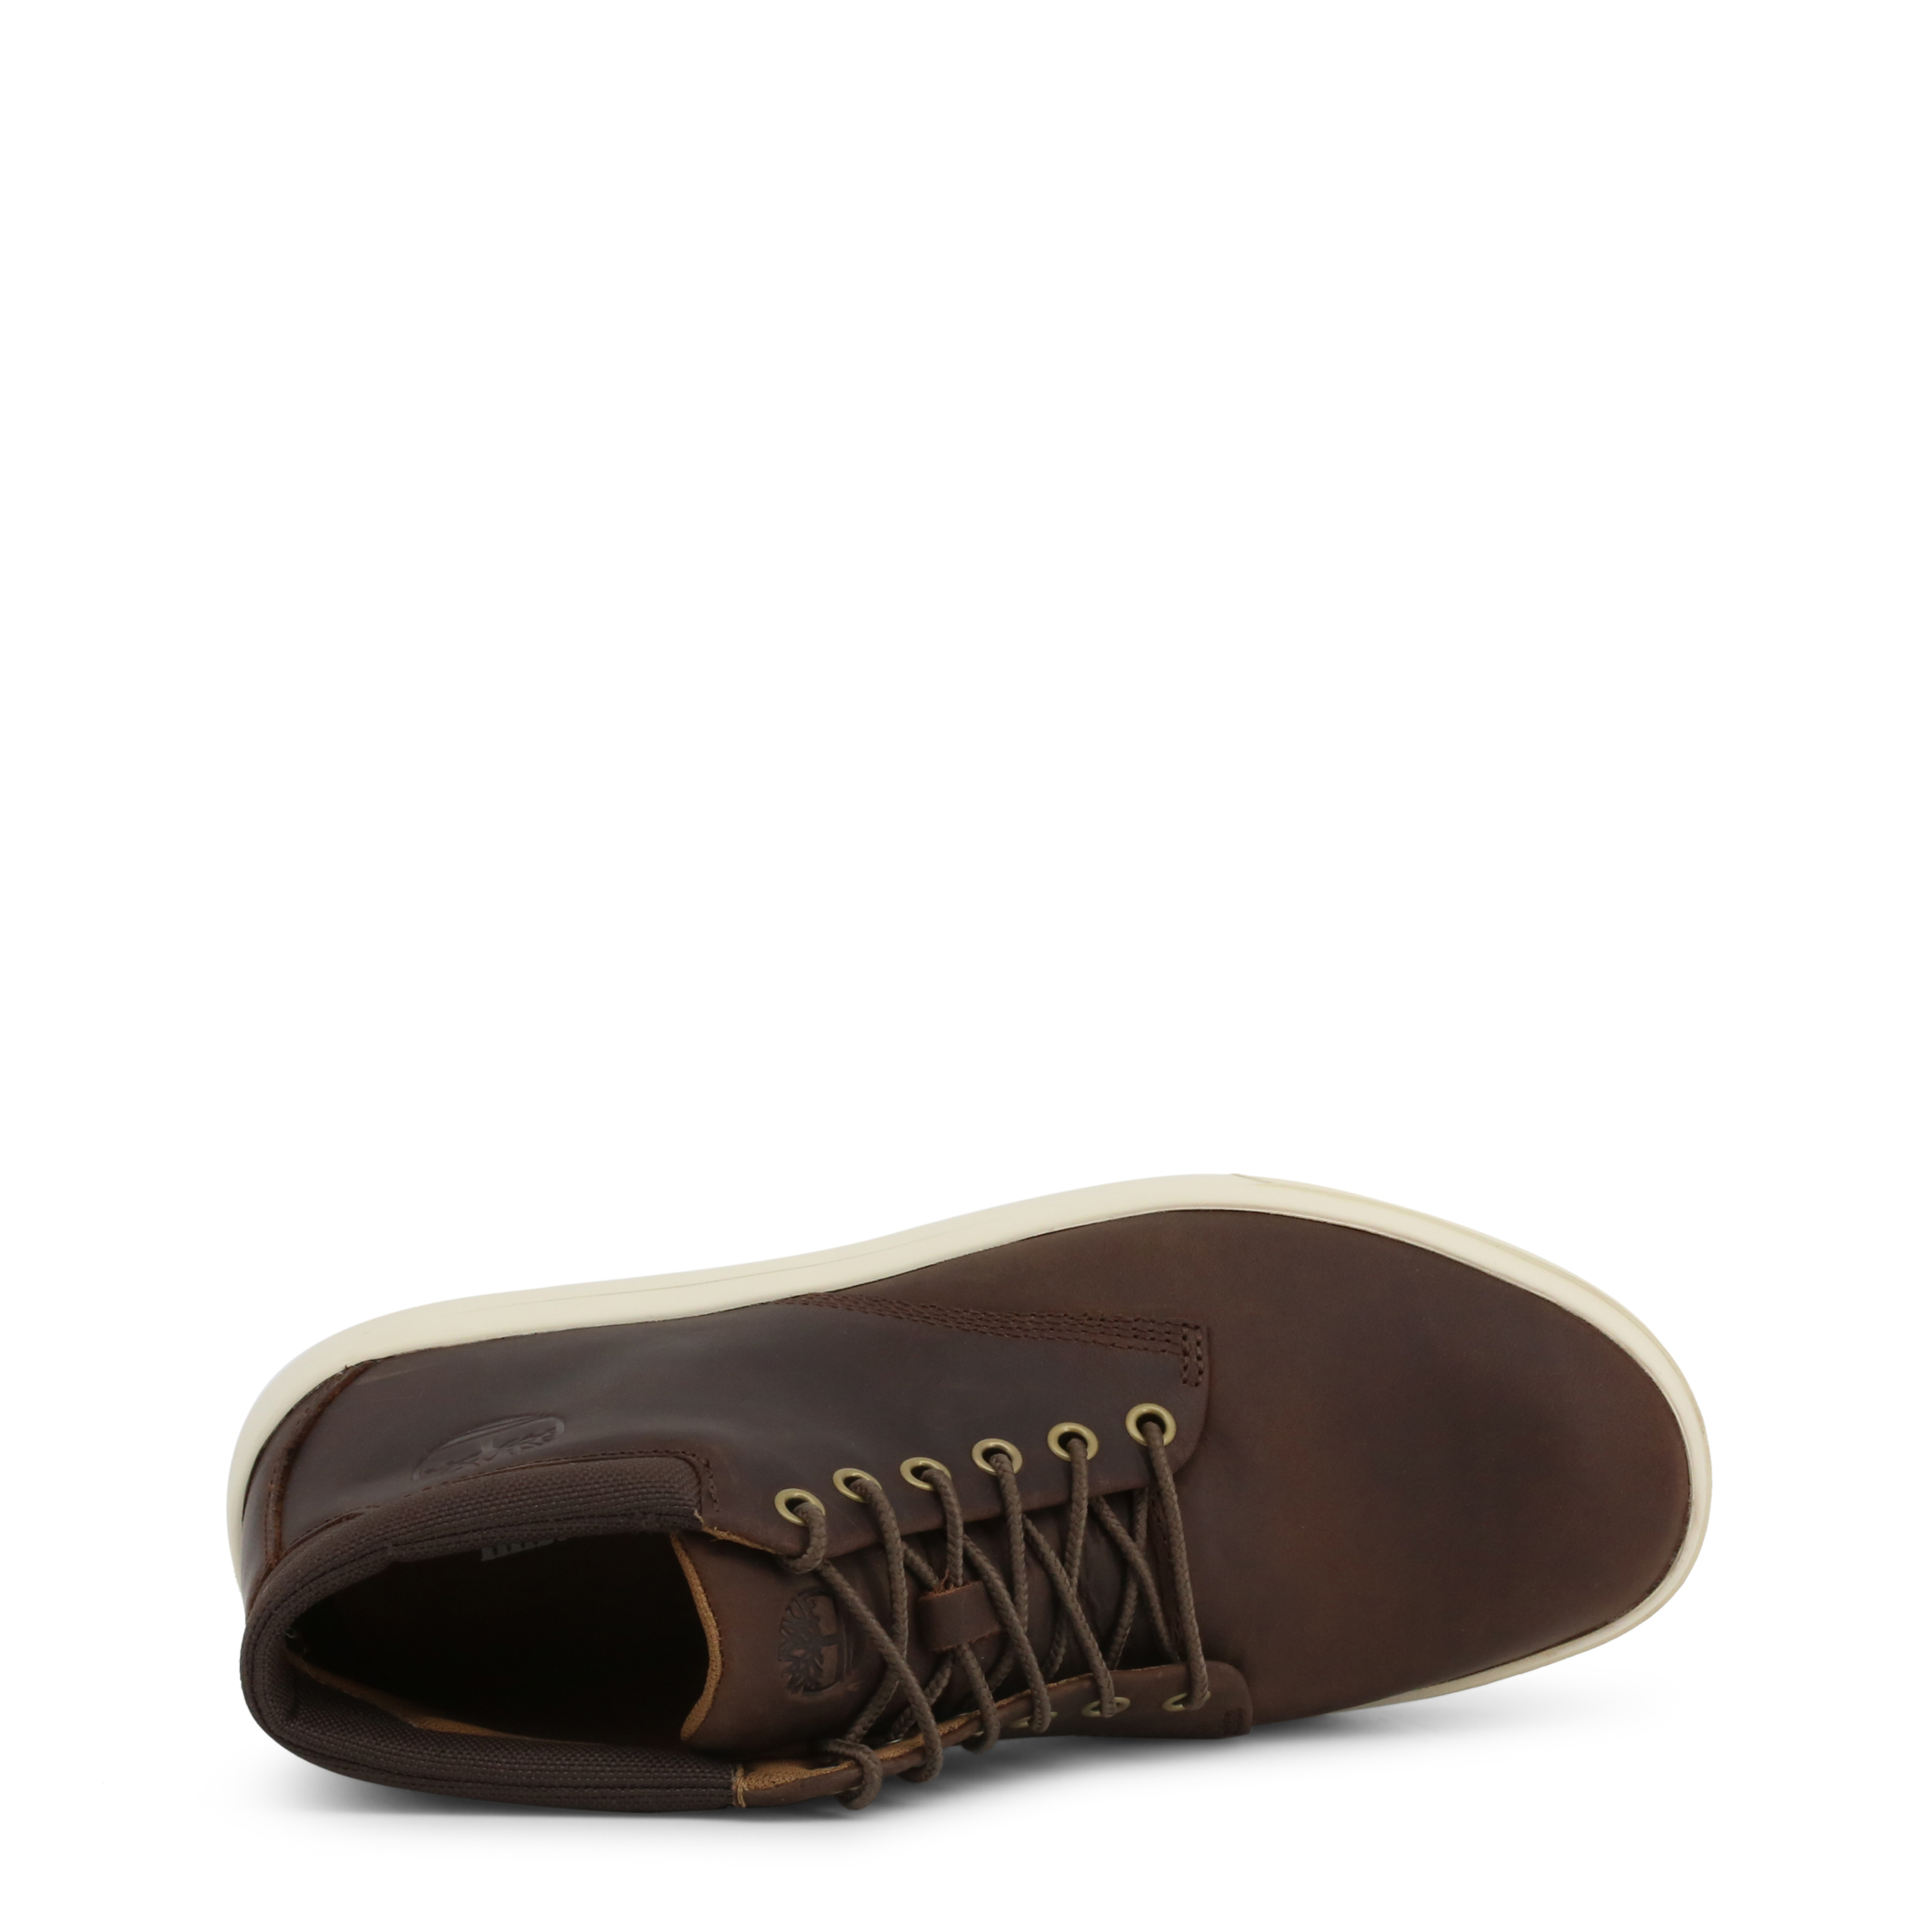 Sneakers-Timberland-ASHWOOD-PRK-Uomo-Marrone-103241 miniatura 3